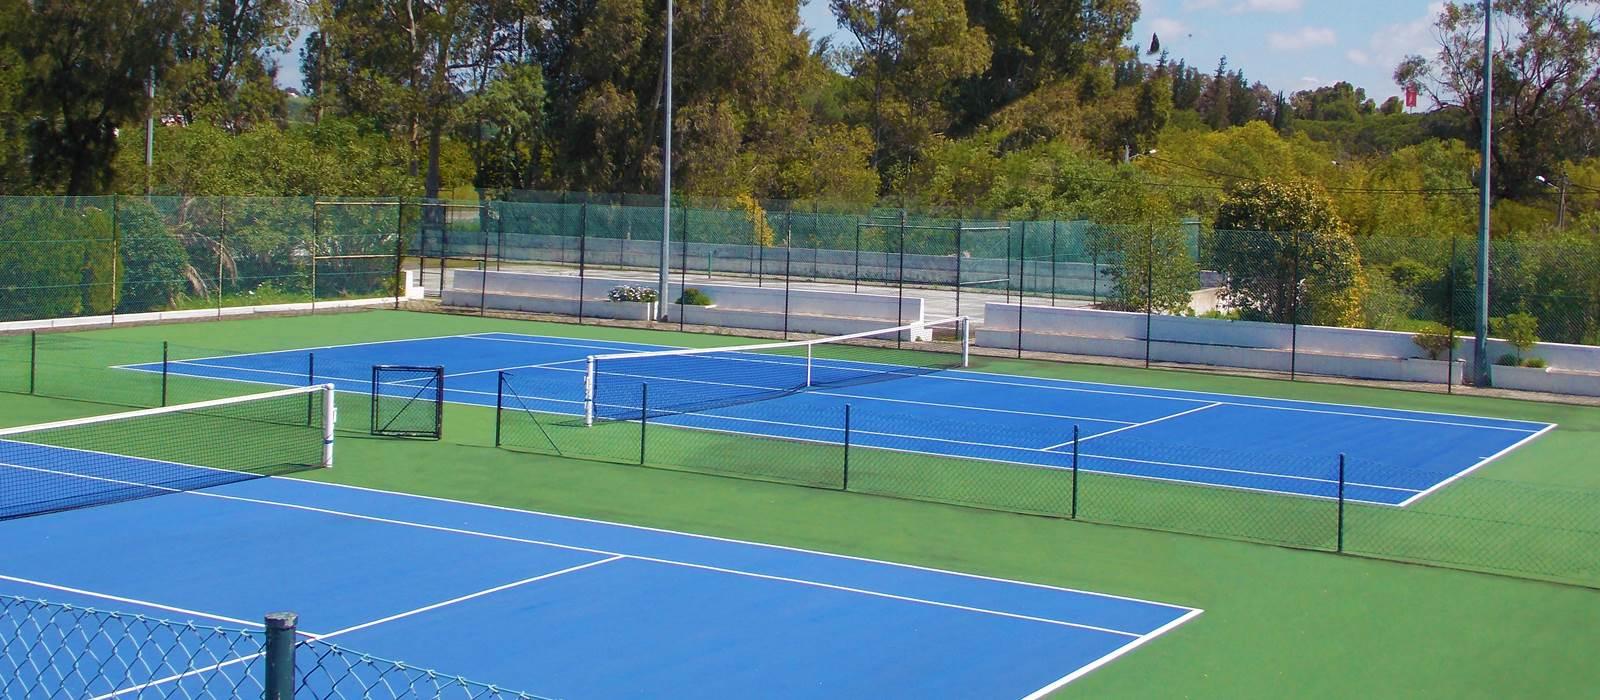 Tennis Courts Algarve Penina Hotel And Golf Resort